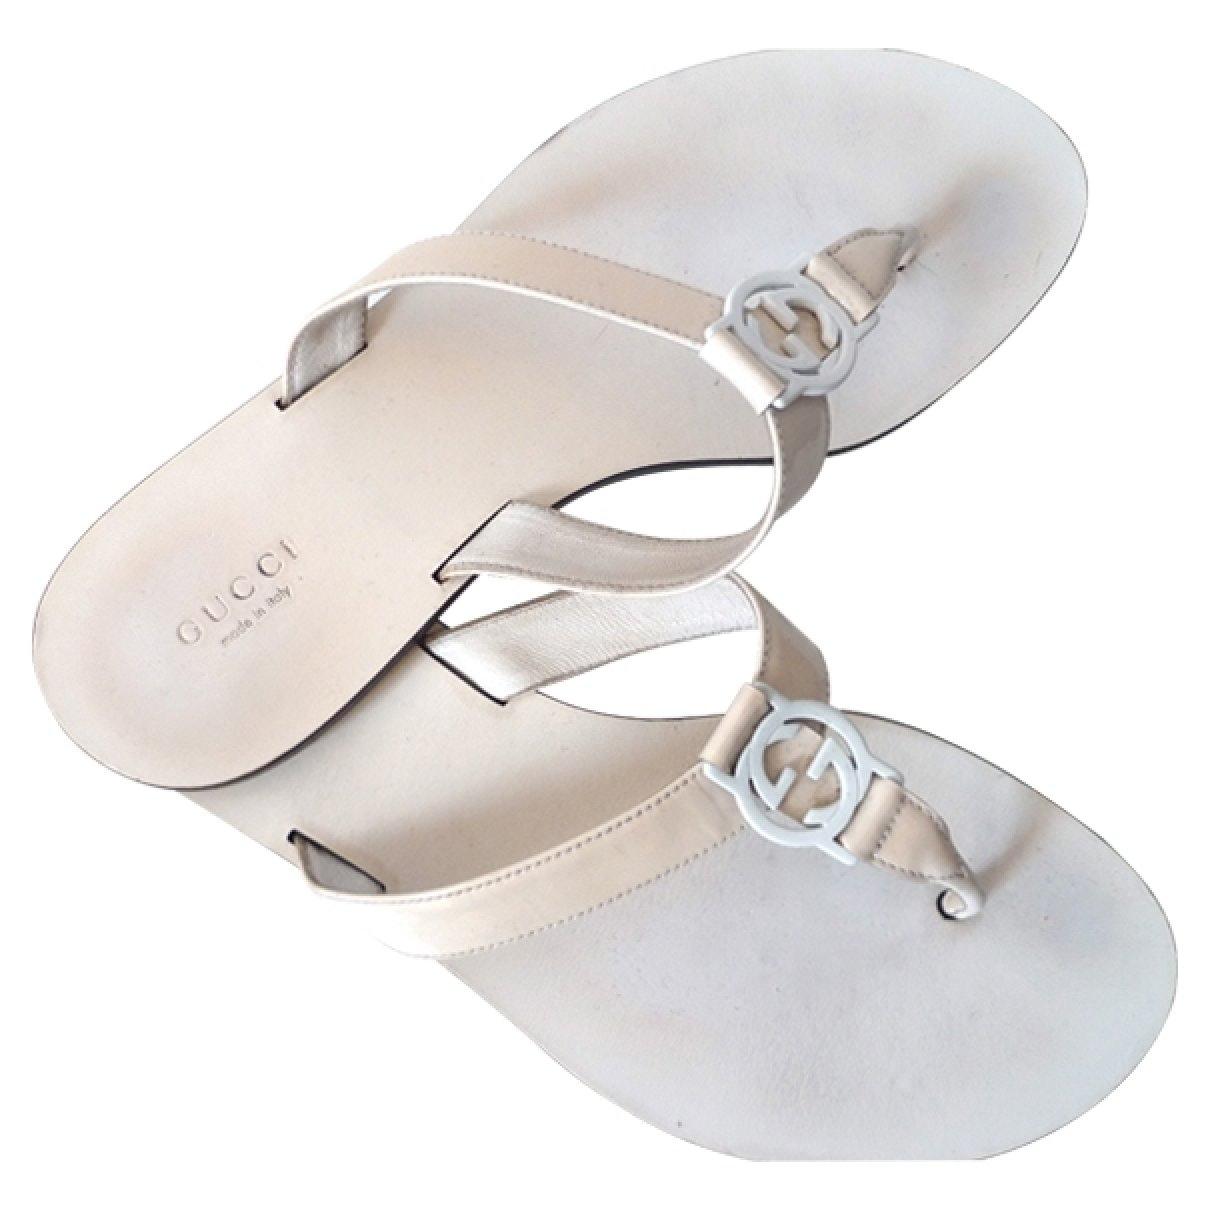 6d48689f13856 Tong femme gucci - Chaussure - lescahiersdalter